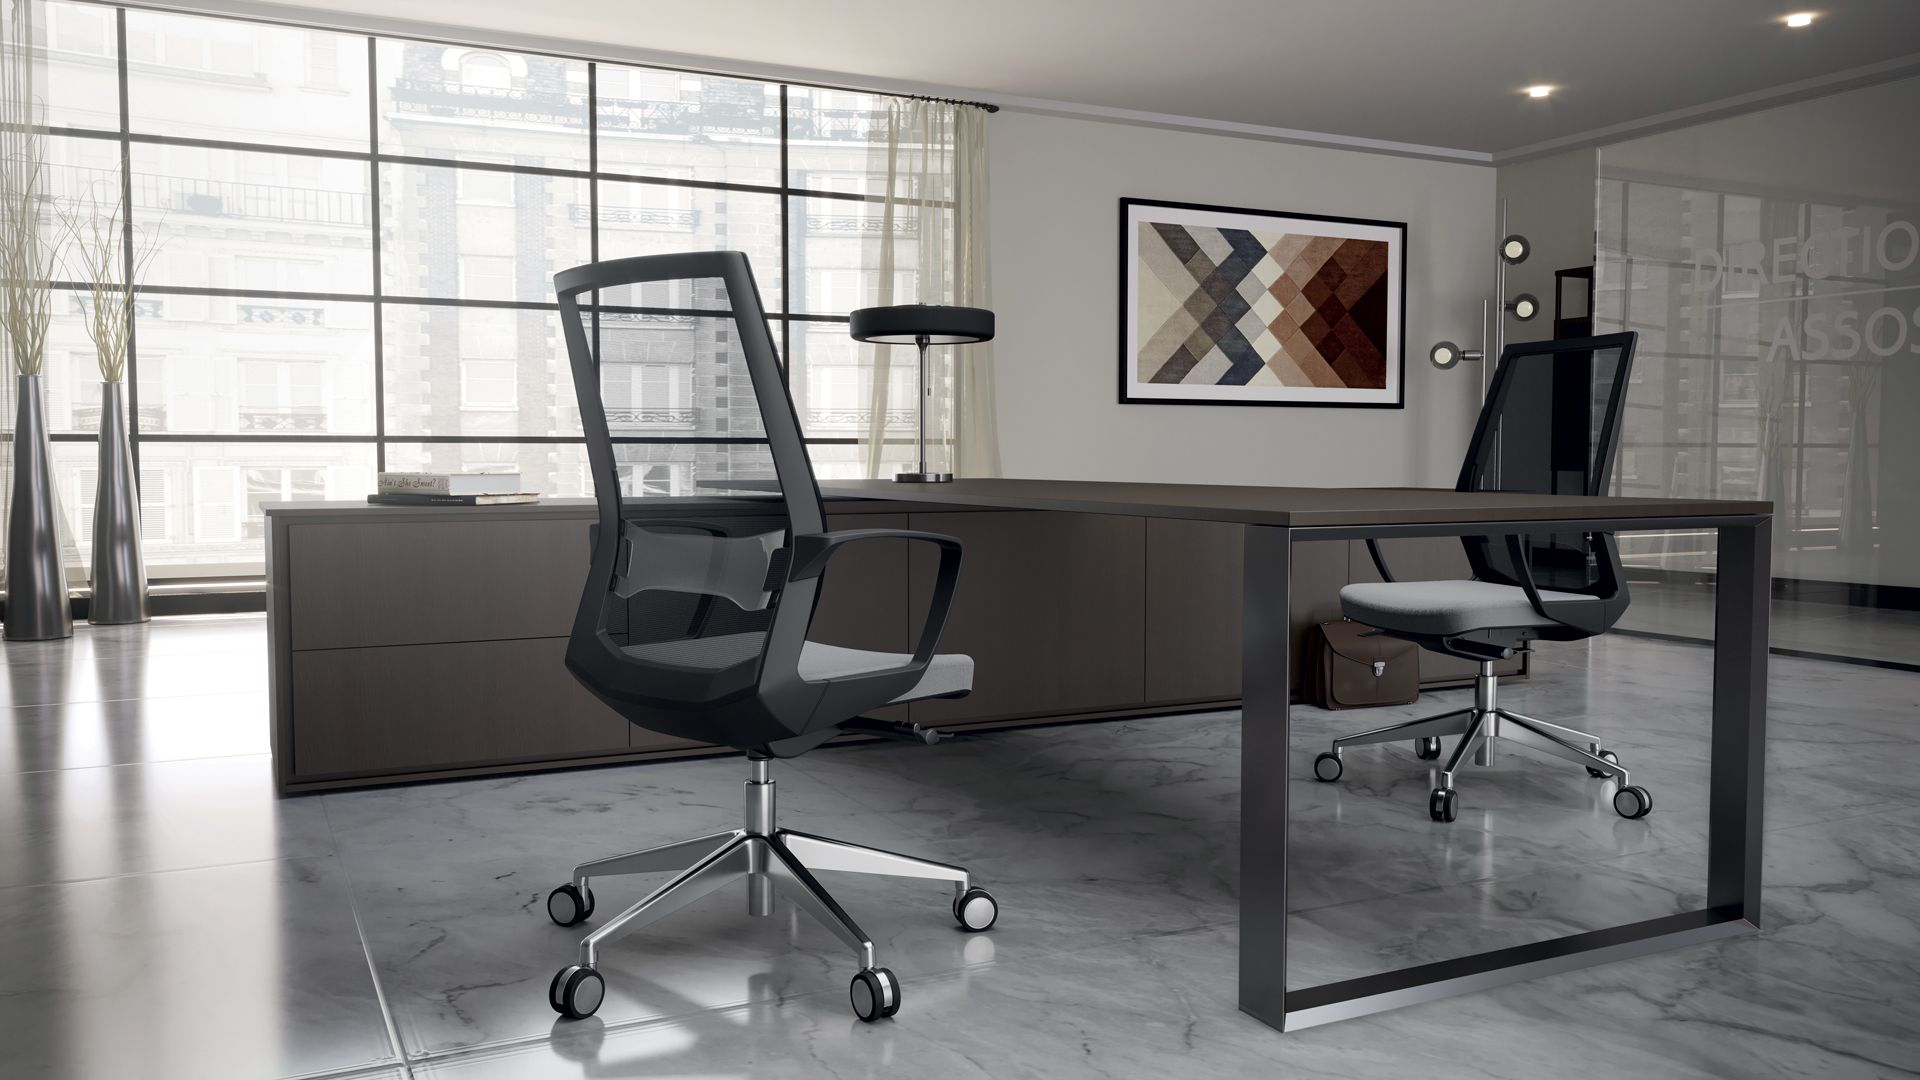 i70-designed-for-excellence